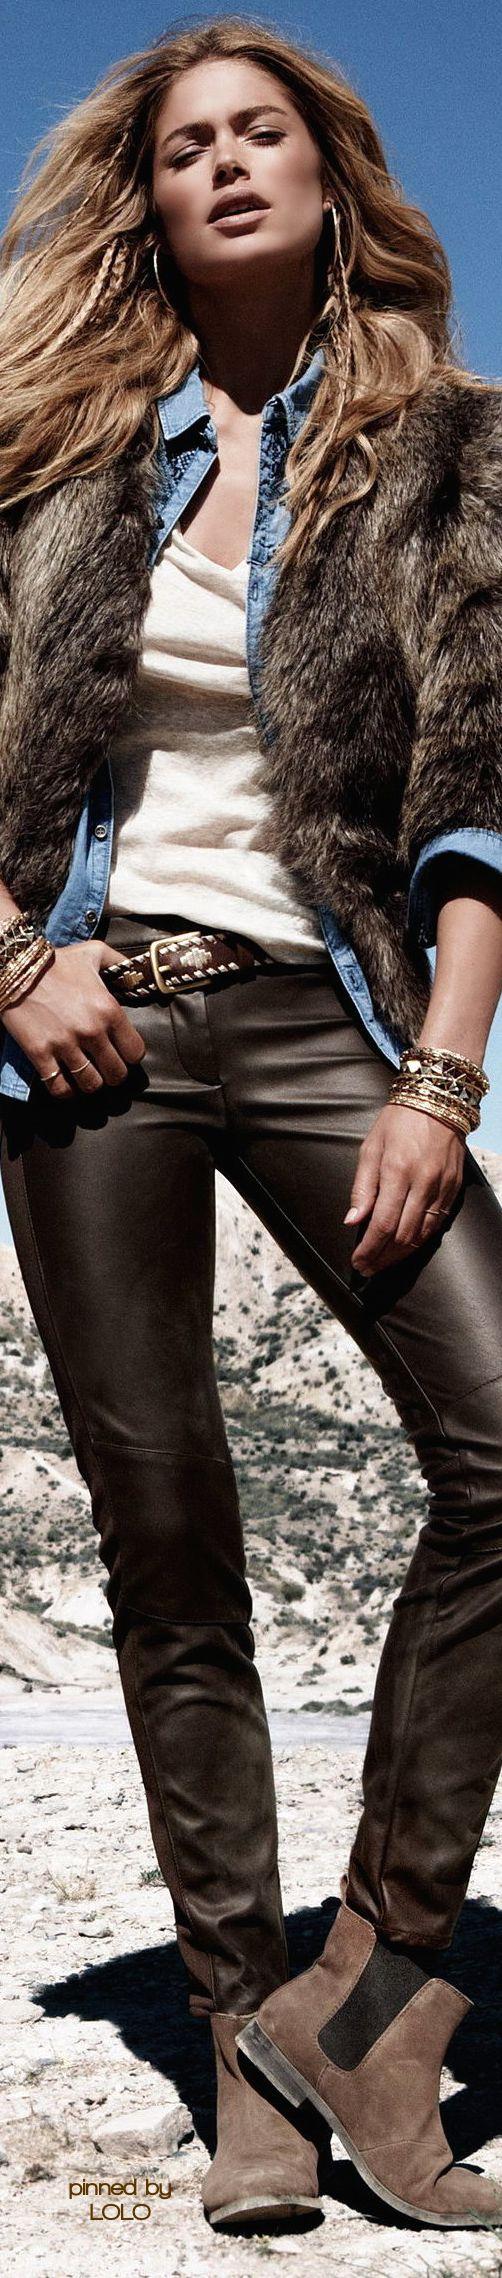 Doutzen Kroes by Daniel Jackson for H&M • ѕтяєєт CHIC • ❤️ Babz ✿ιиѕριяαтισи❀ #abbigliamento